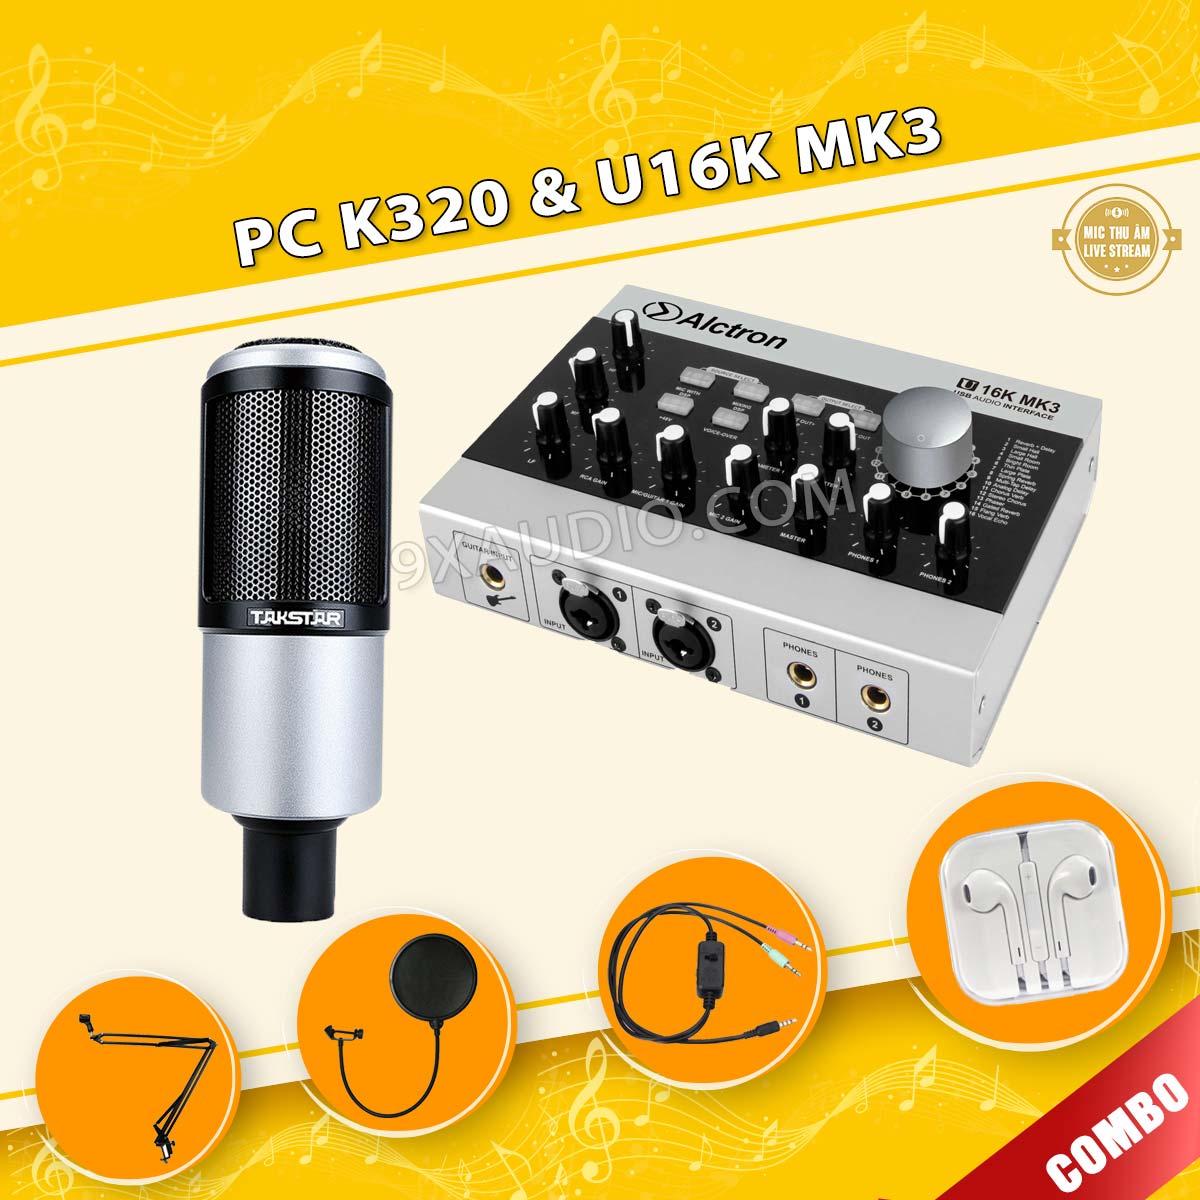 mic thu âm pc k320 u16k mk3 full 106 1